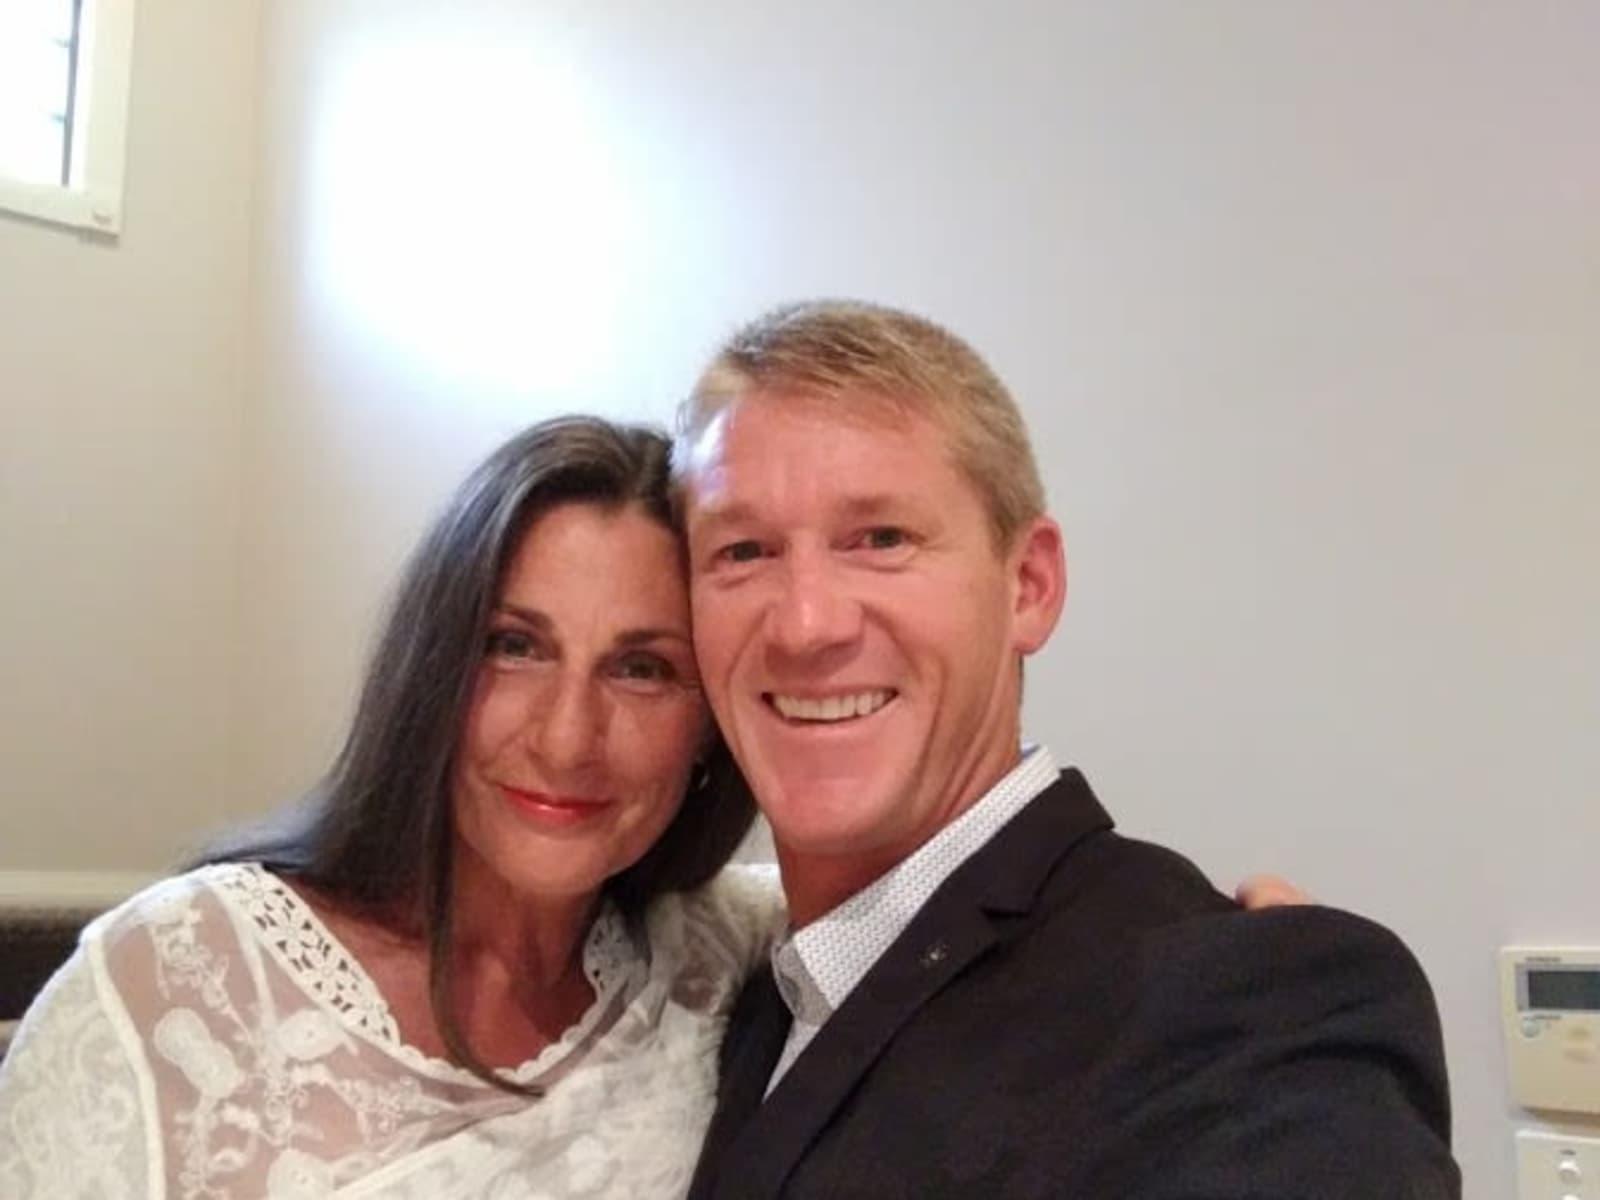 Roz & Chris from Gold Coast, Queensland, Australia